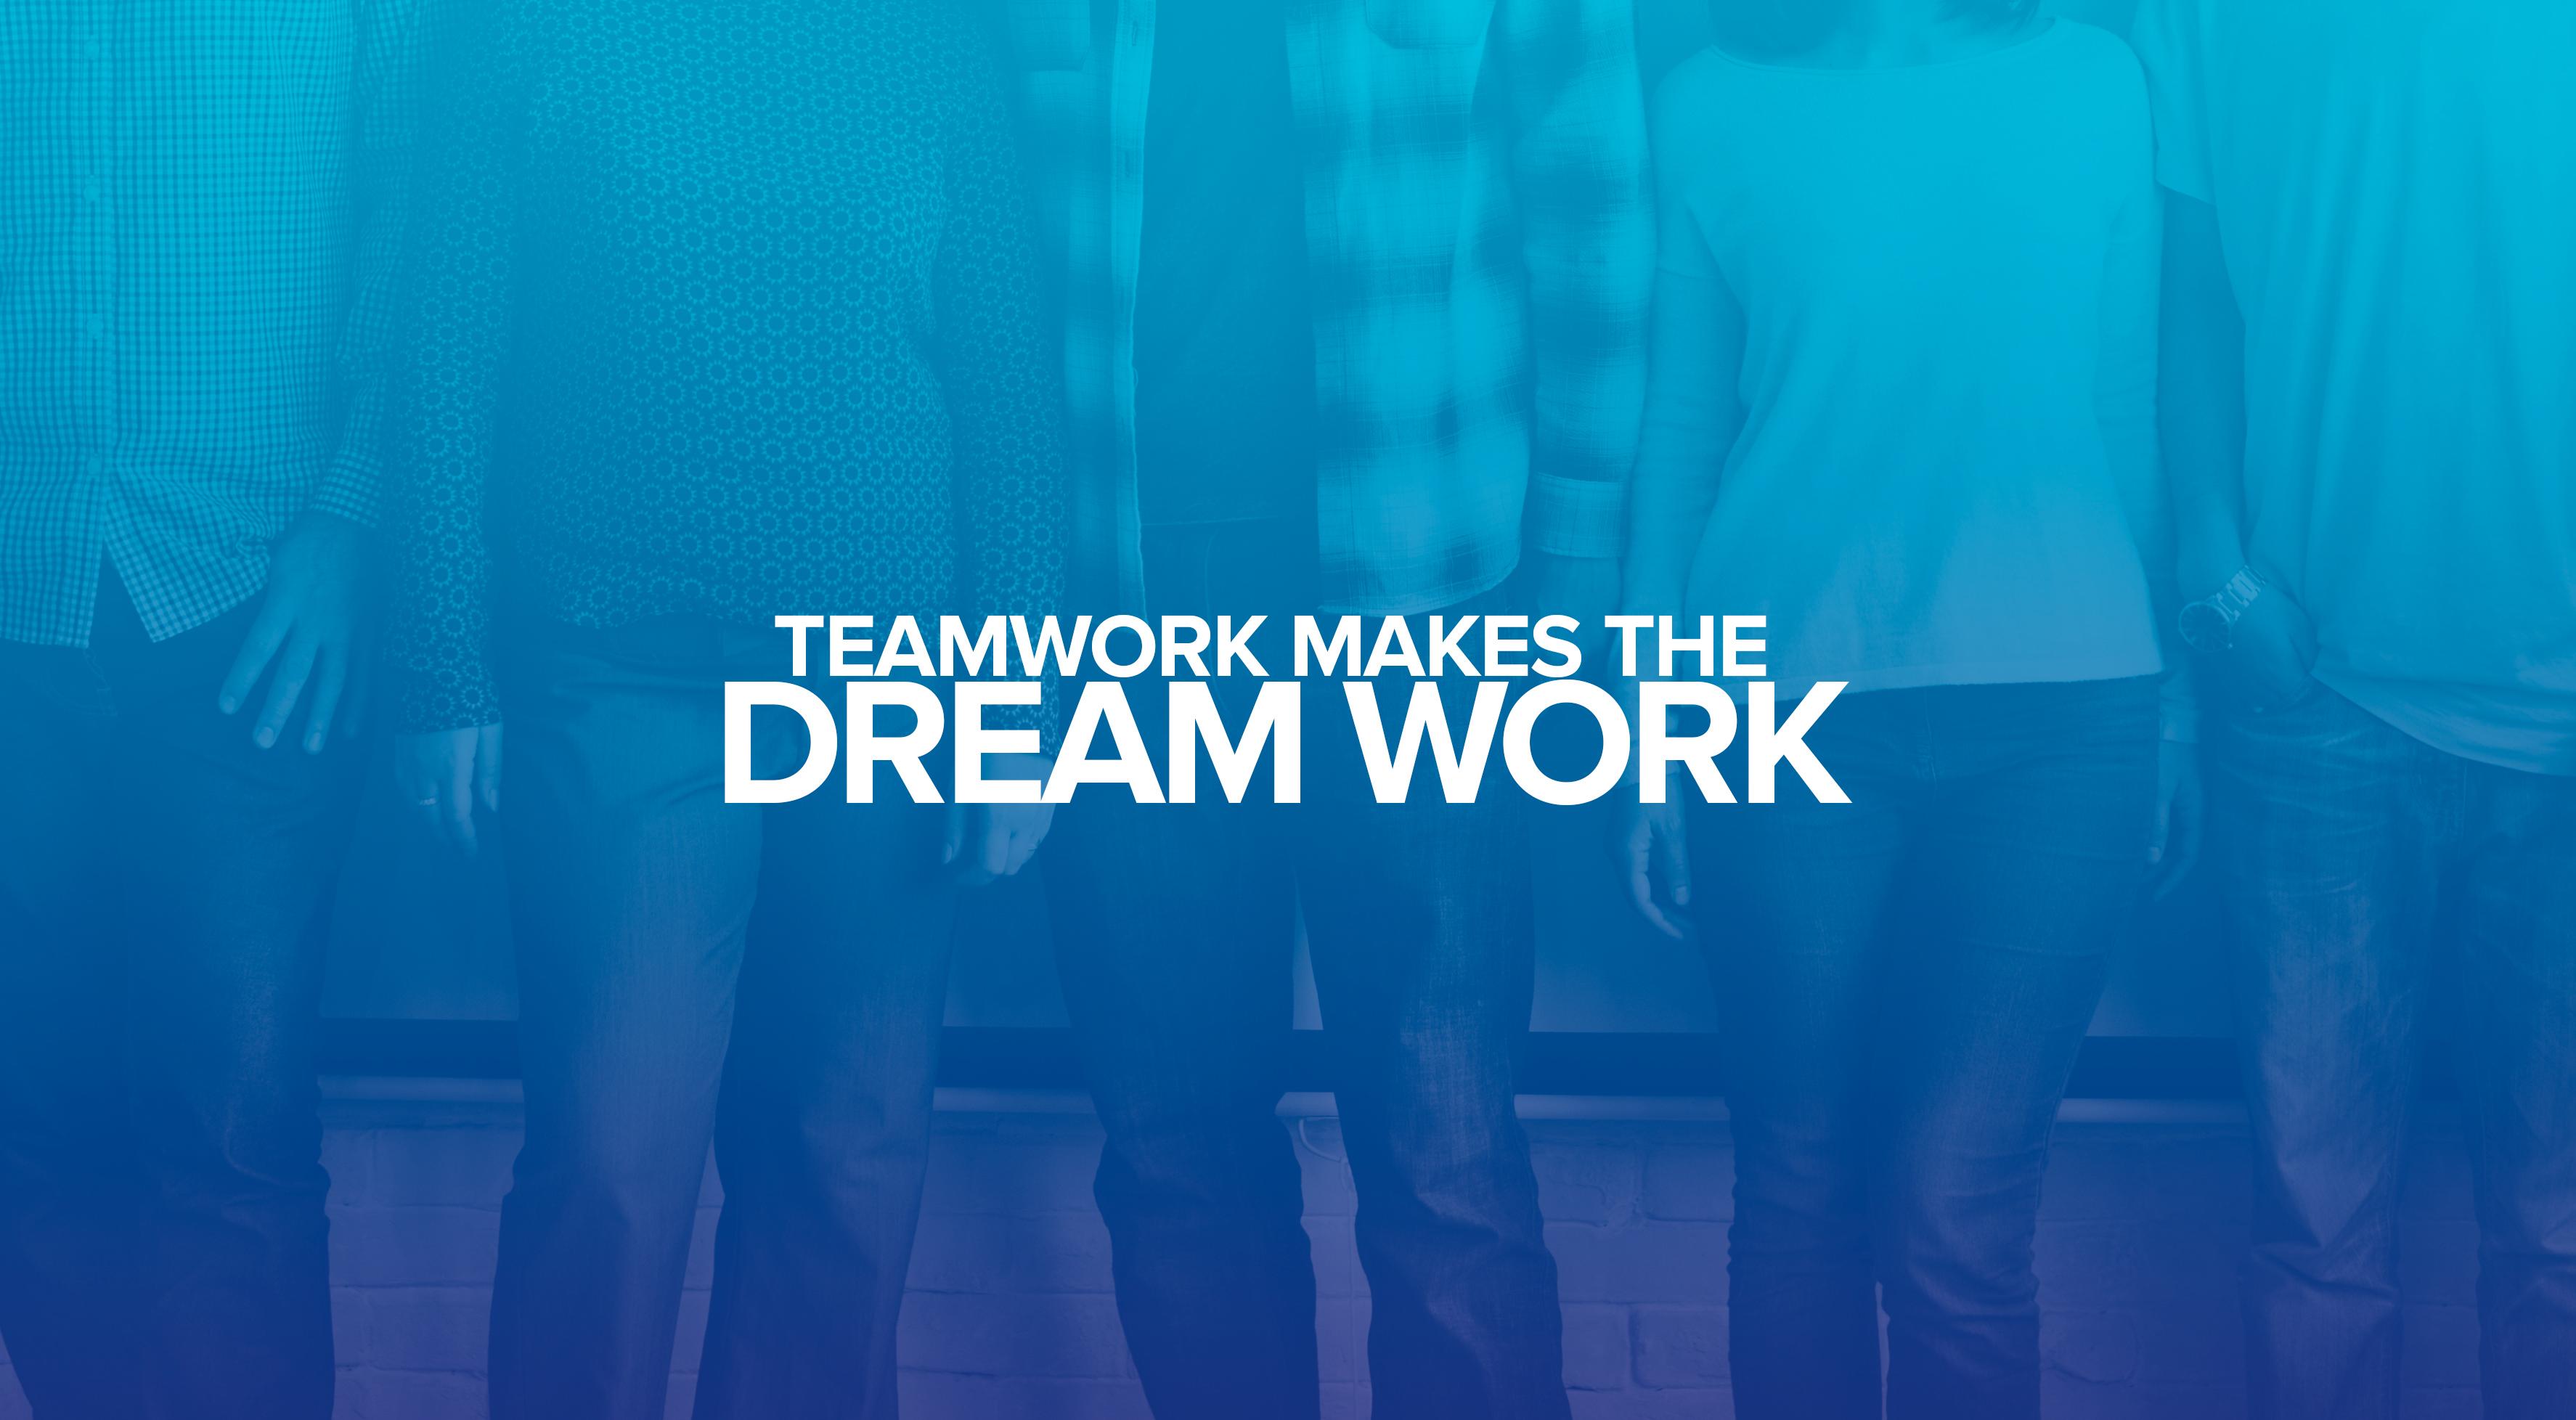 Dream work, Team work, Popular Quotes, HD, Typography